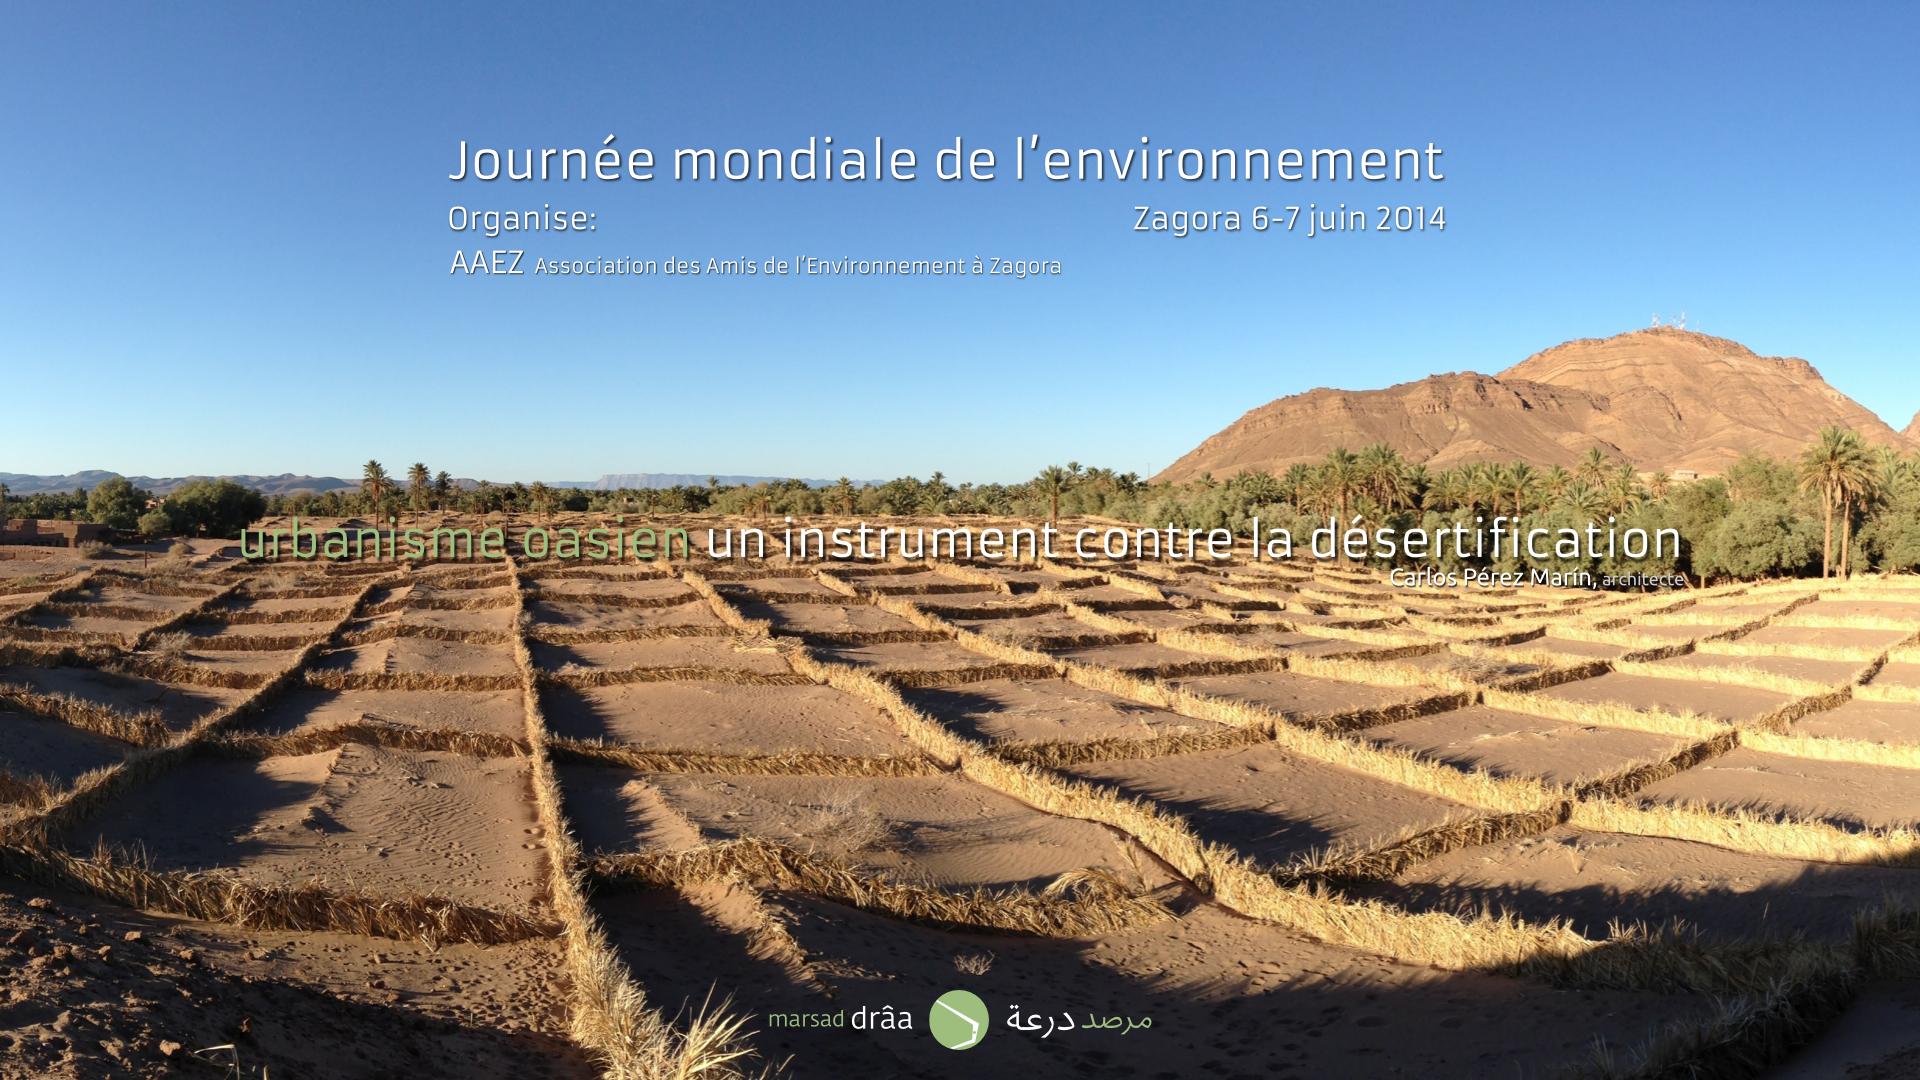 URBANISME OASIEN, UN INSTRUMENT CONTRE LA DÉSERTIFICATION, Zagora (Maroc) 2014